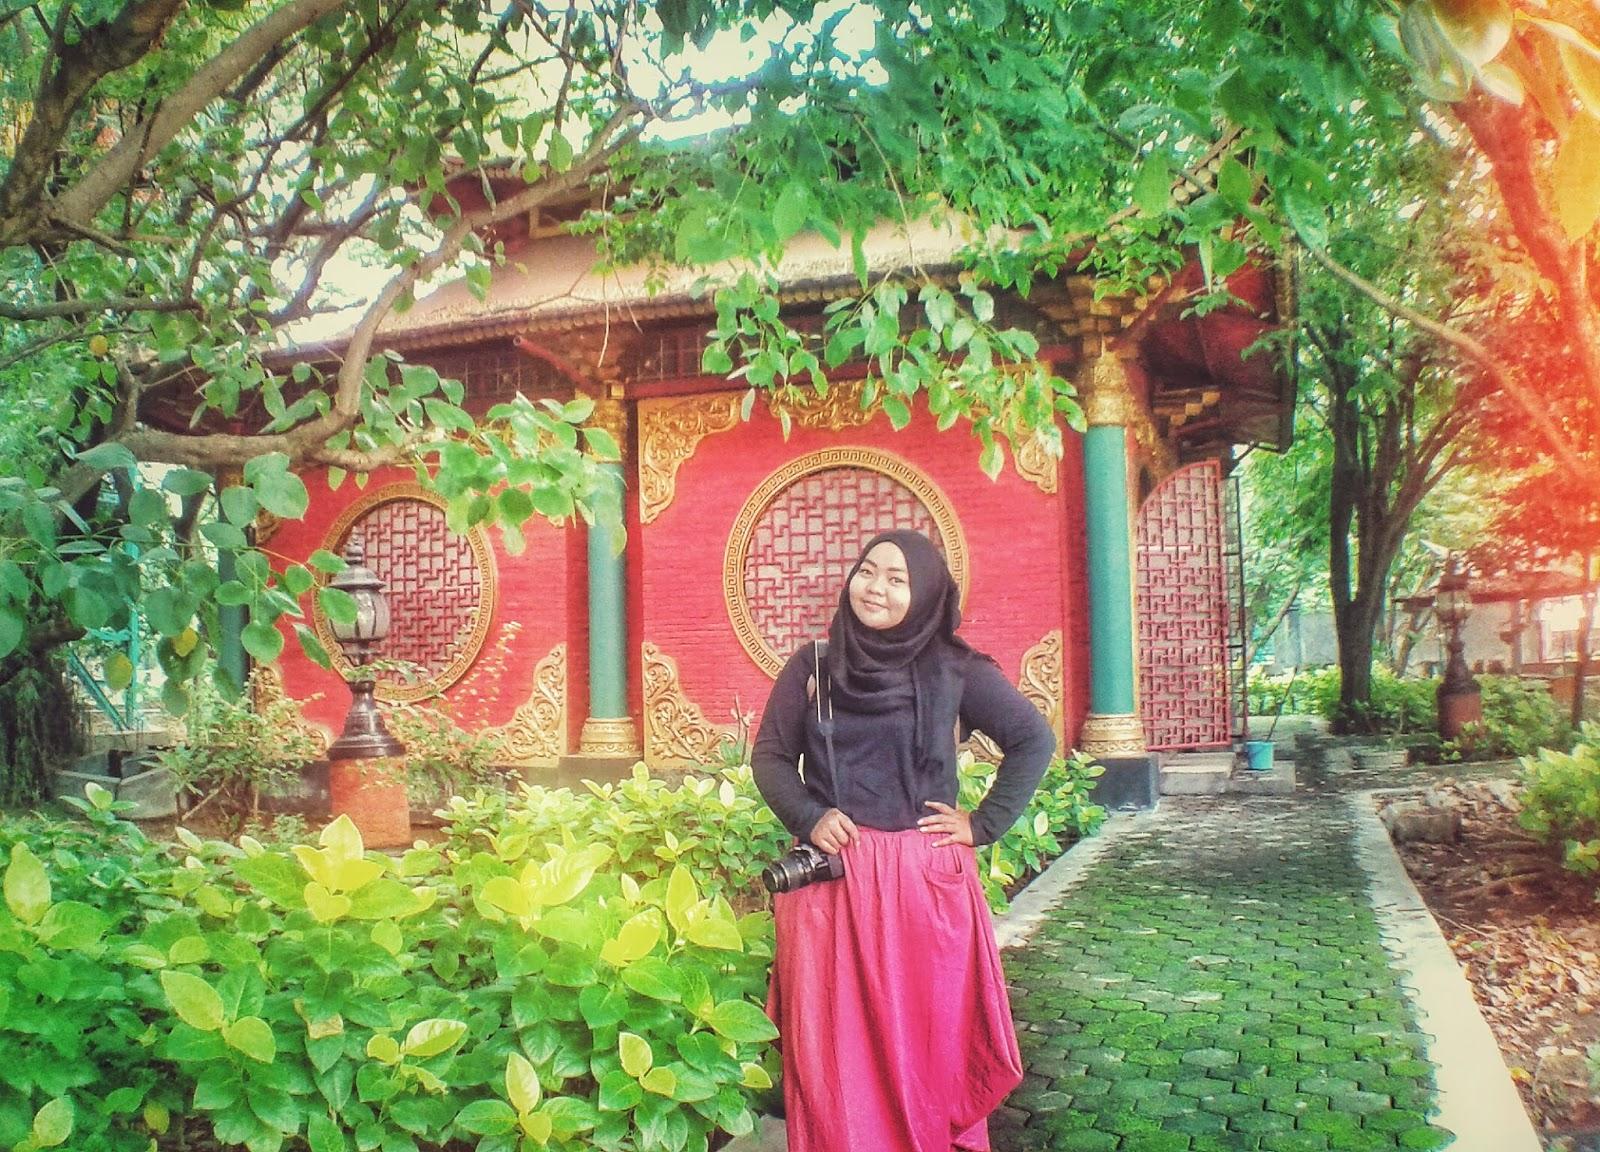 Surabaya Rasa Thailand Patung Buddha 4 Wajah Kenpark Copyright Dindahnurma